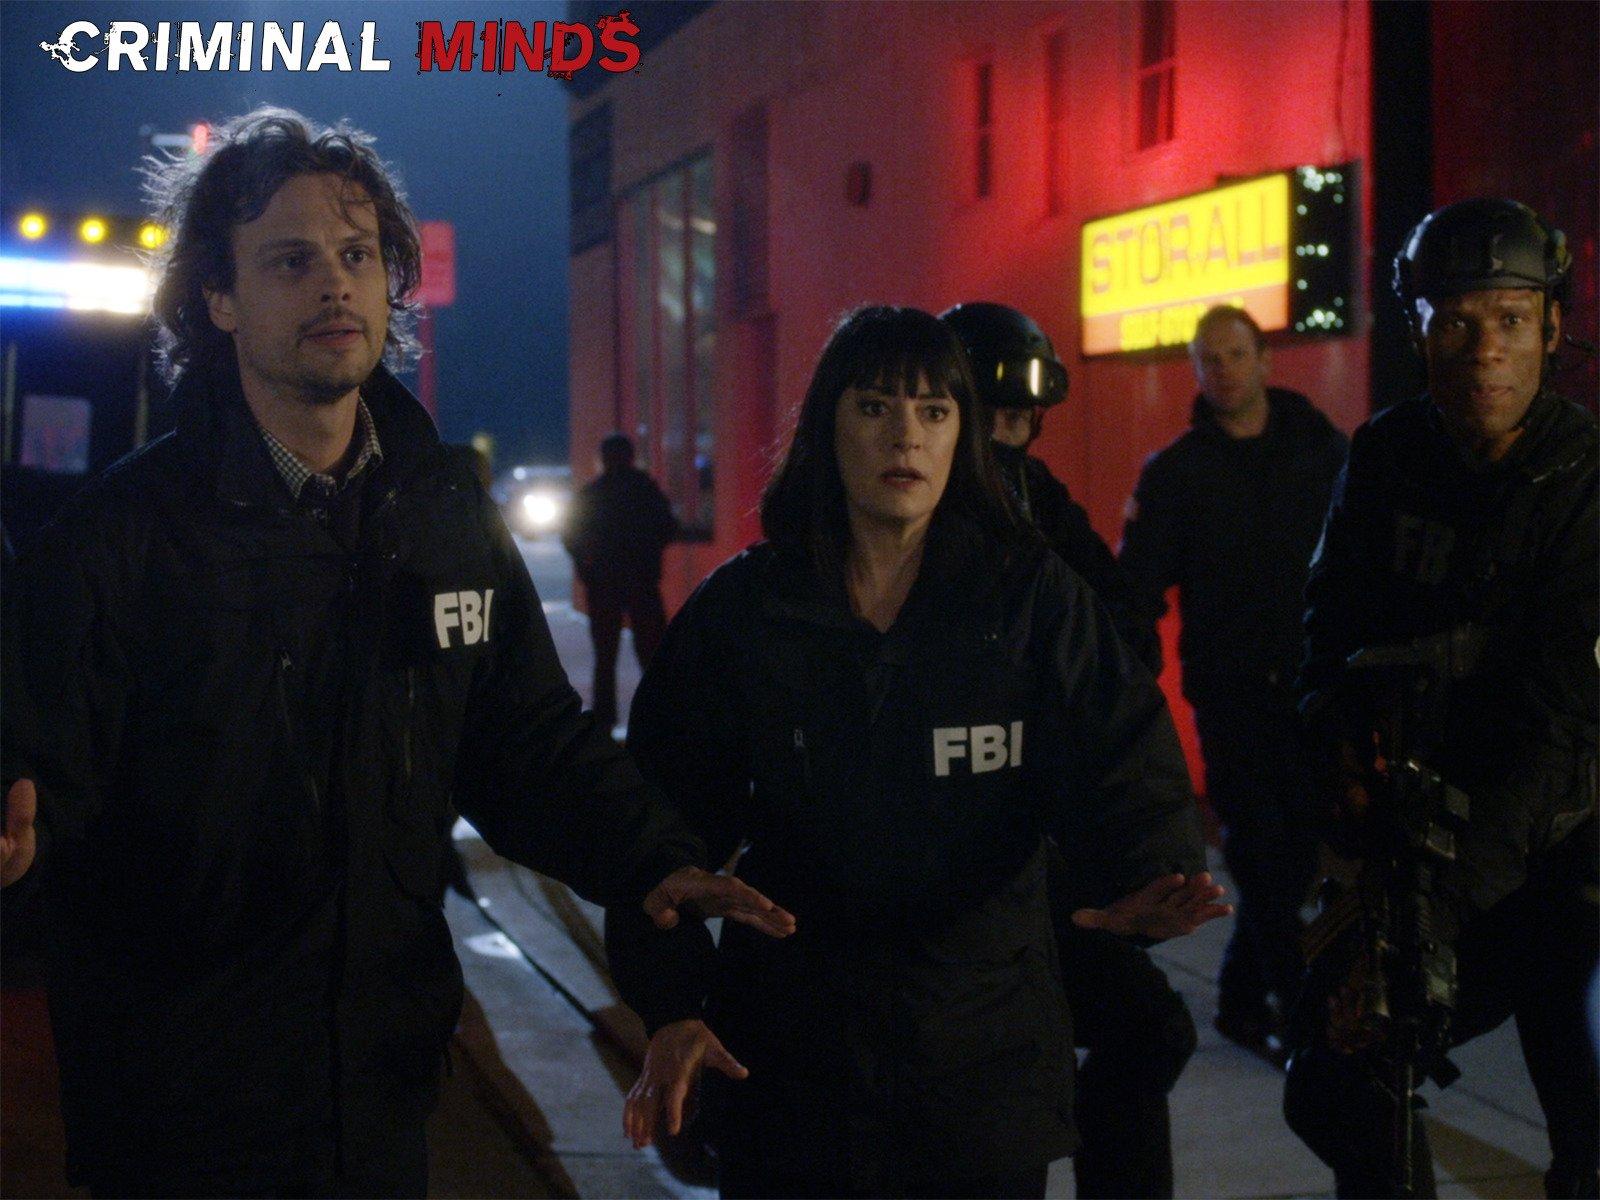 Criminal Minds Fbi Logo Wallpaper